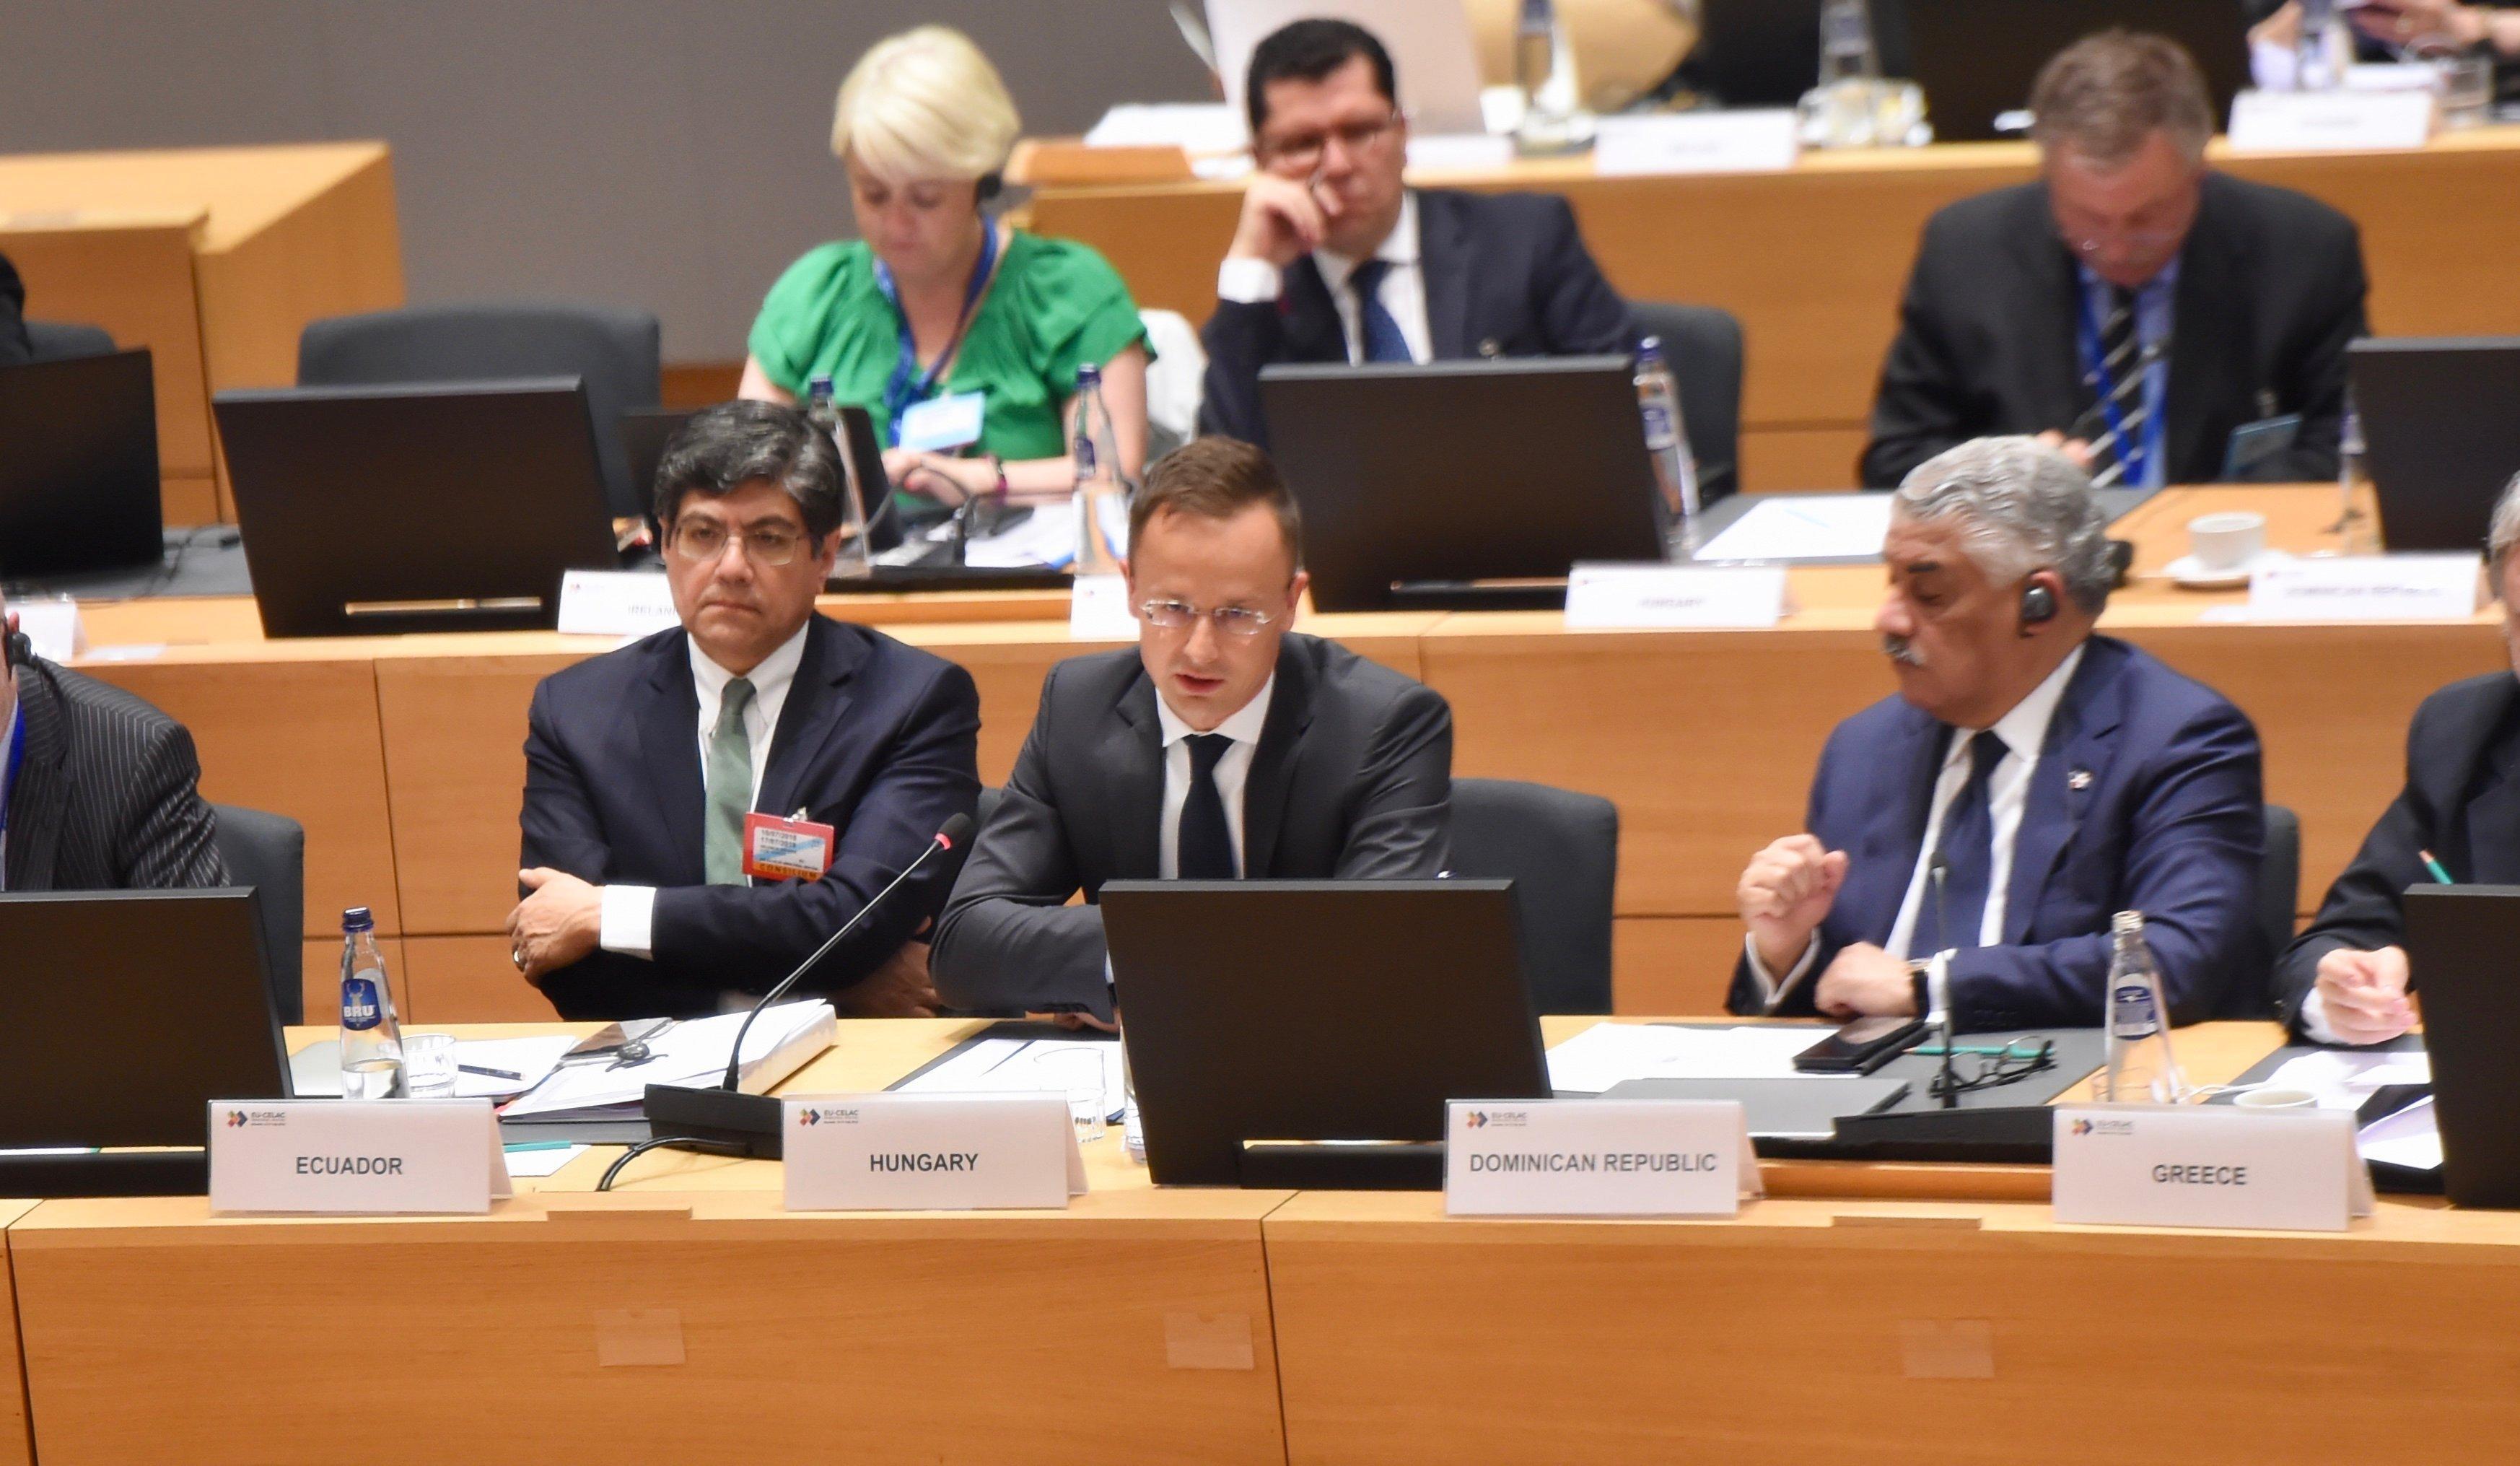 Szijjártó: Ungarn will UNO-Migrationspakt boykottieren post's picture